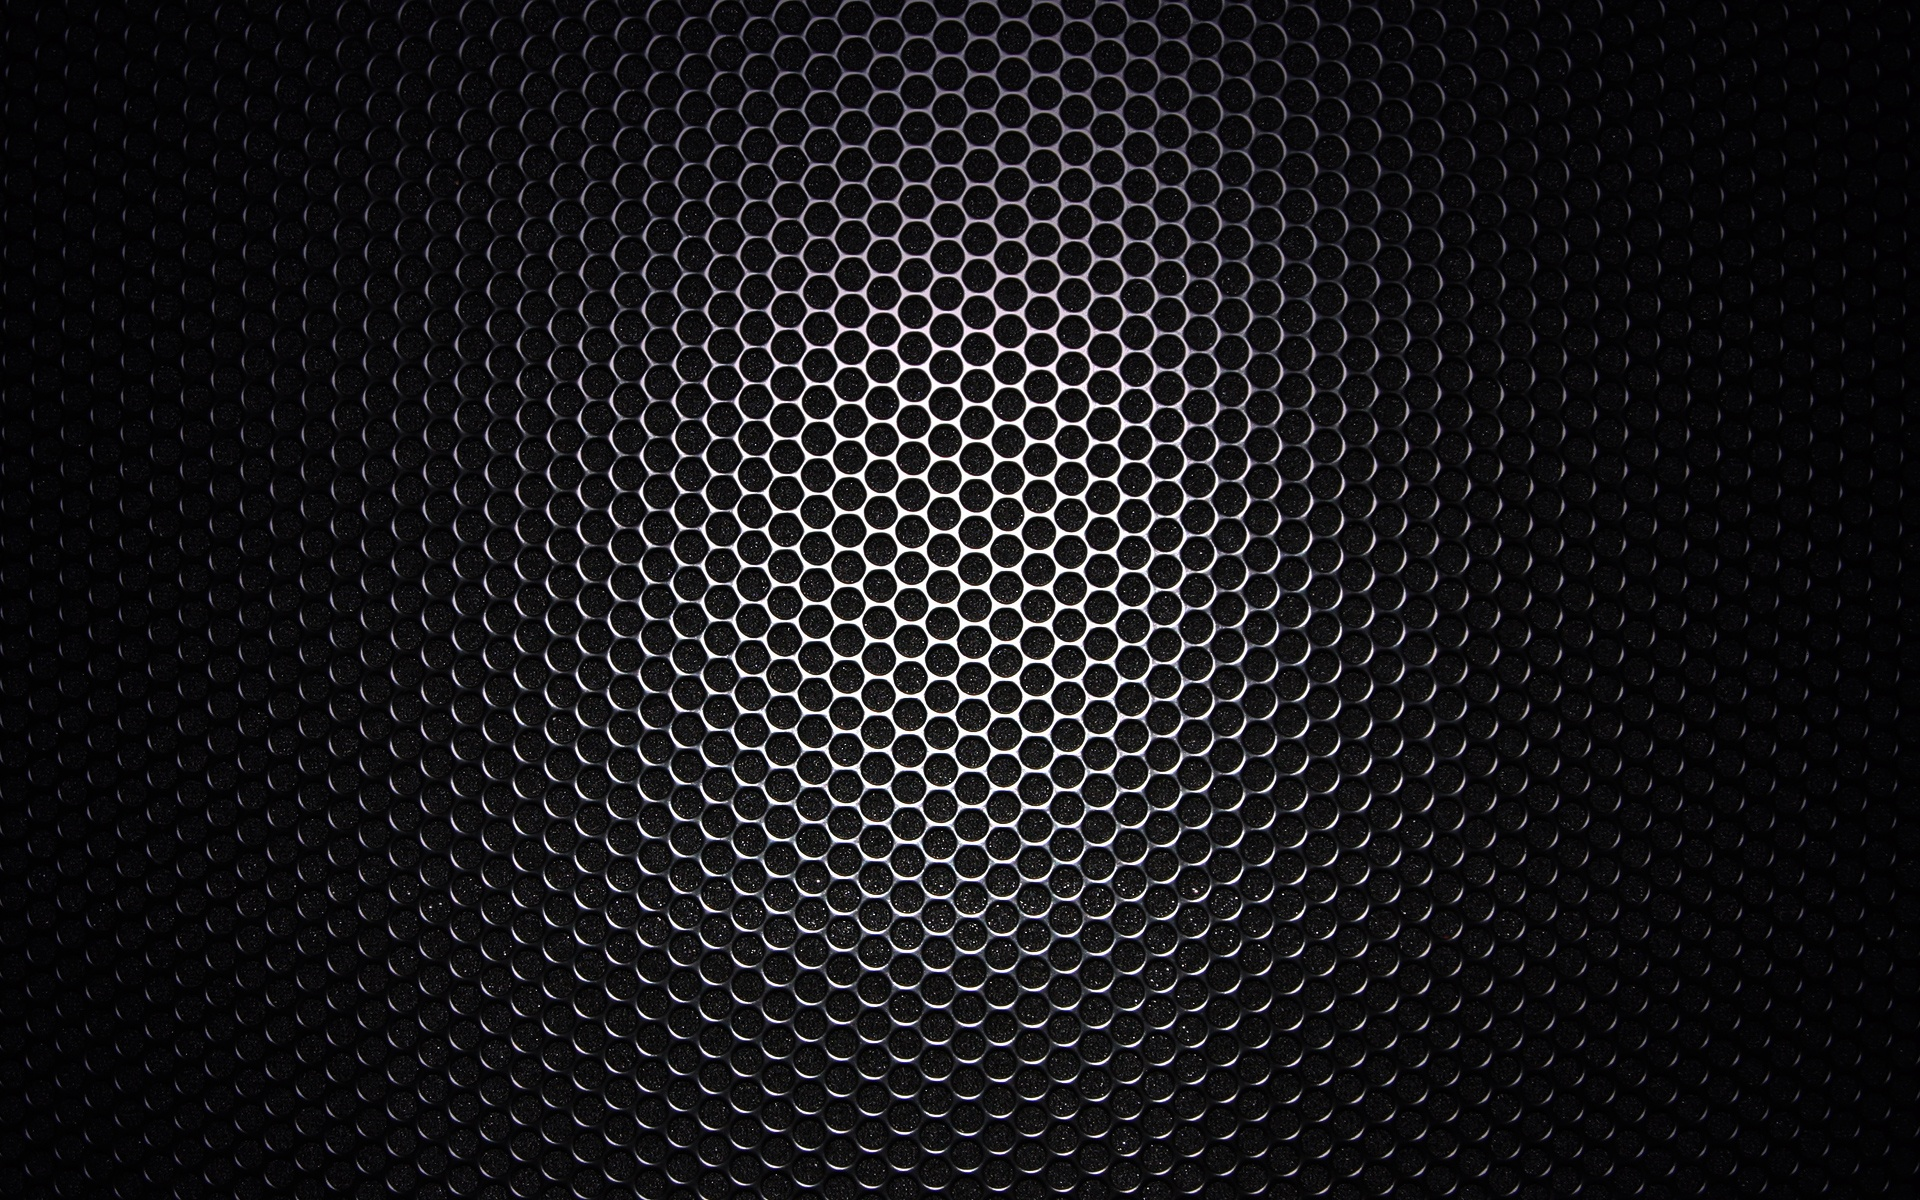 black honeycomb pattern wallpapers black honeycomb pattern stock